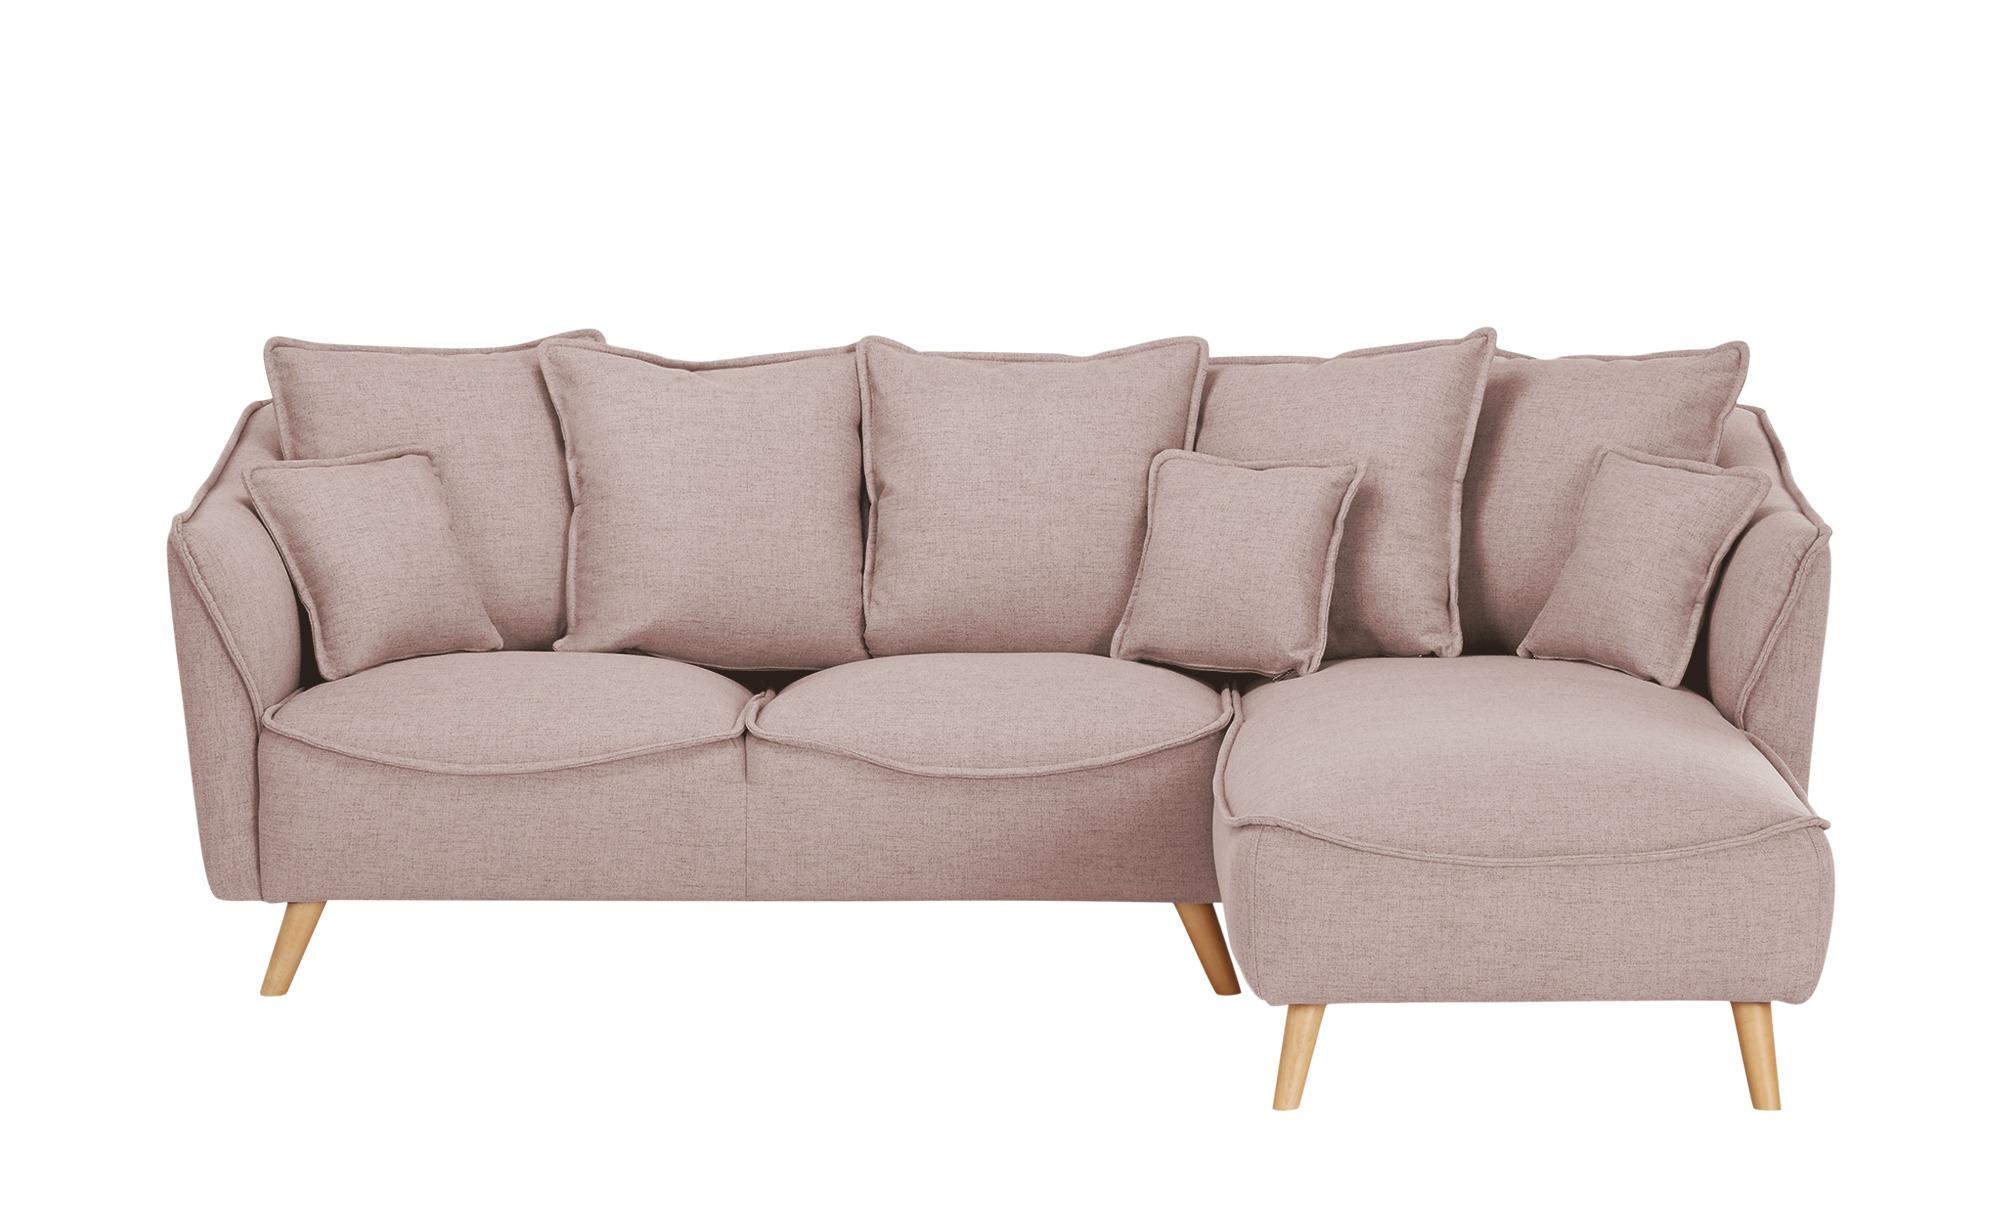 Ecksofa  Vejen ¦ rosa/pink ¦ Maße (cm): H: 80 Polstermöbel > Sofas > Ecksofas - Höffner